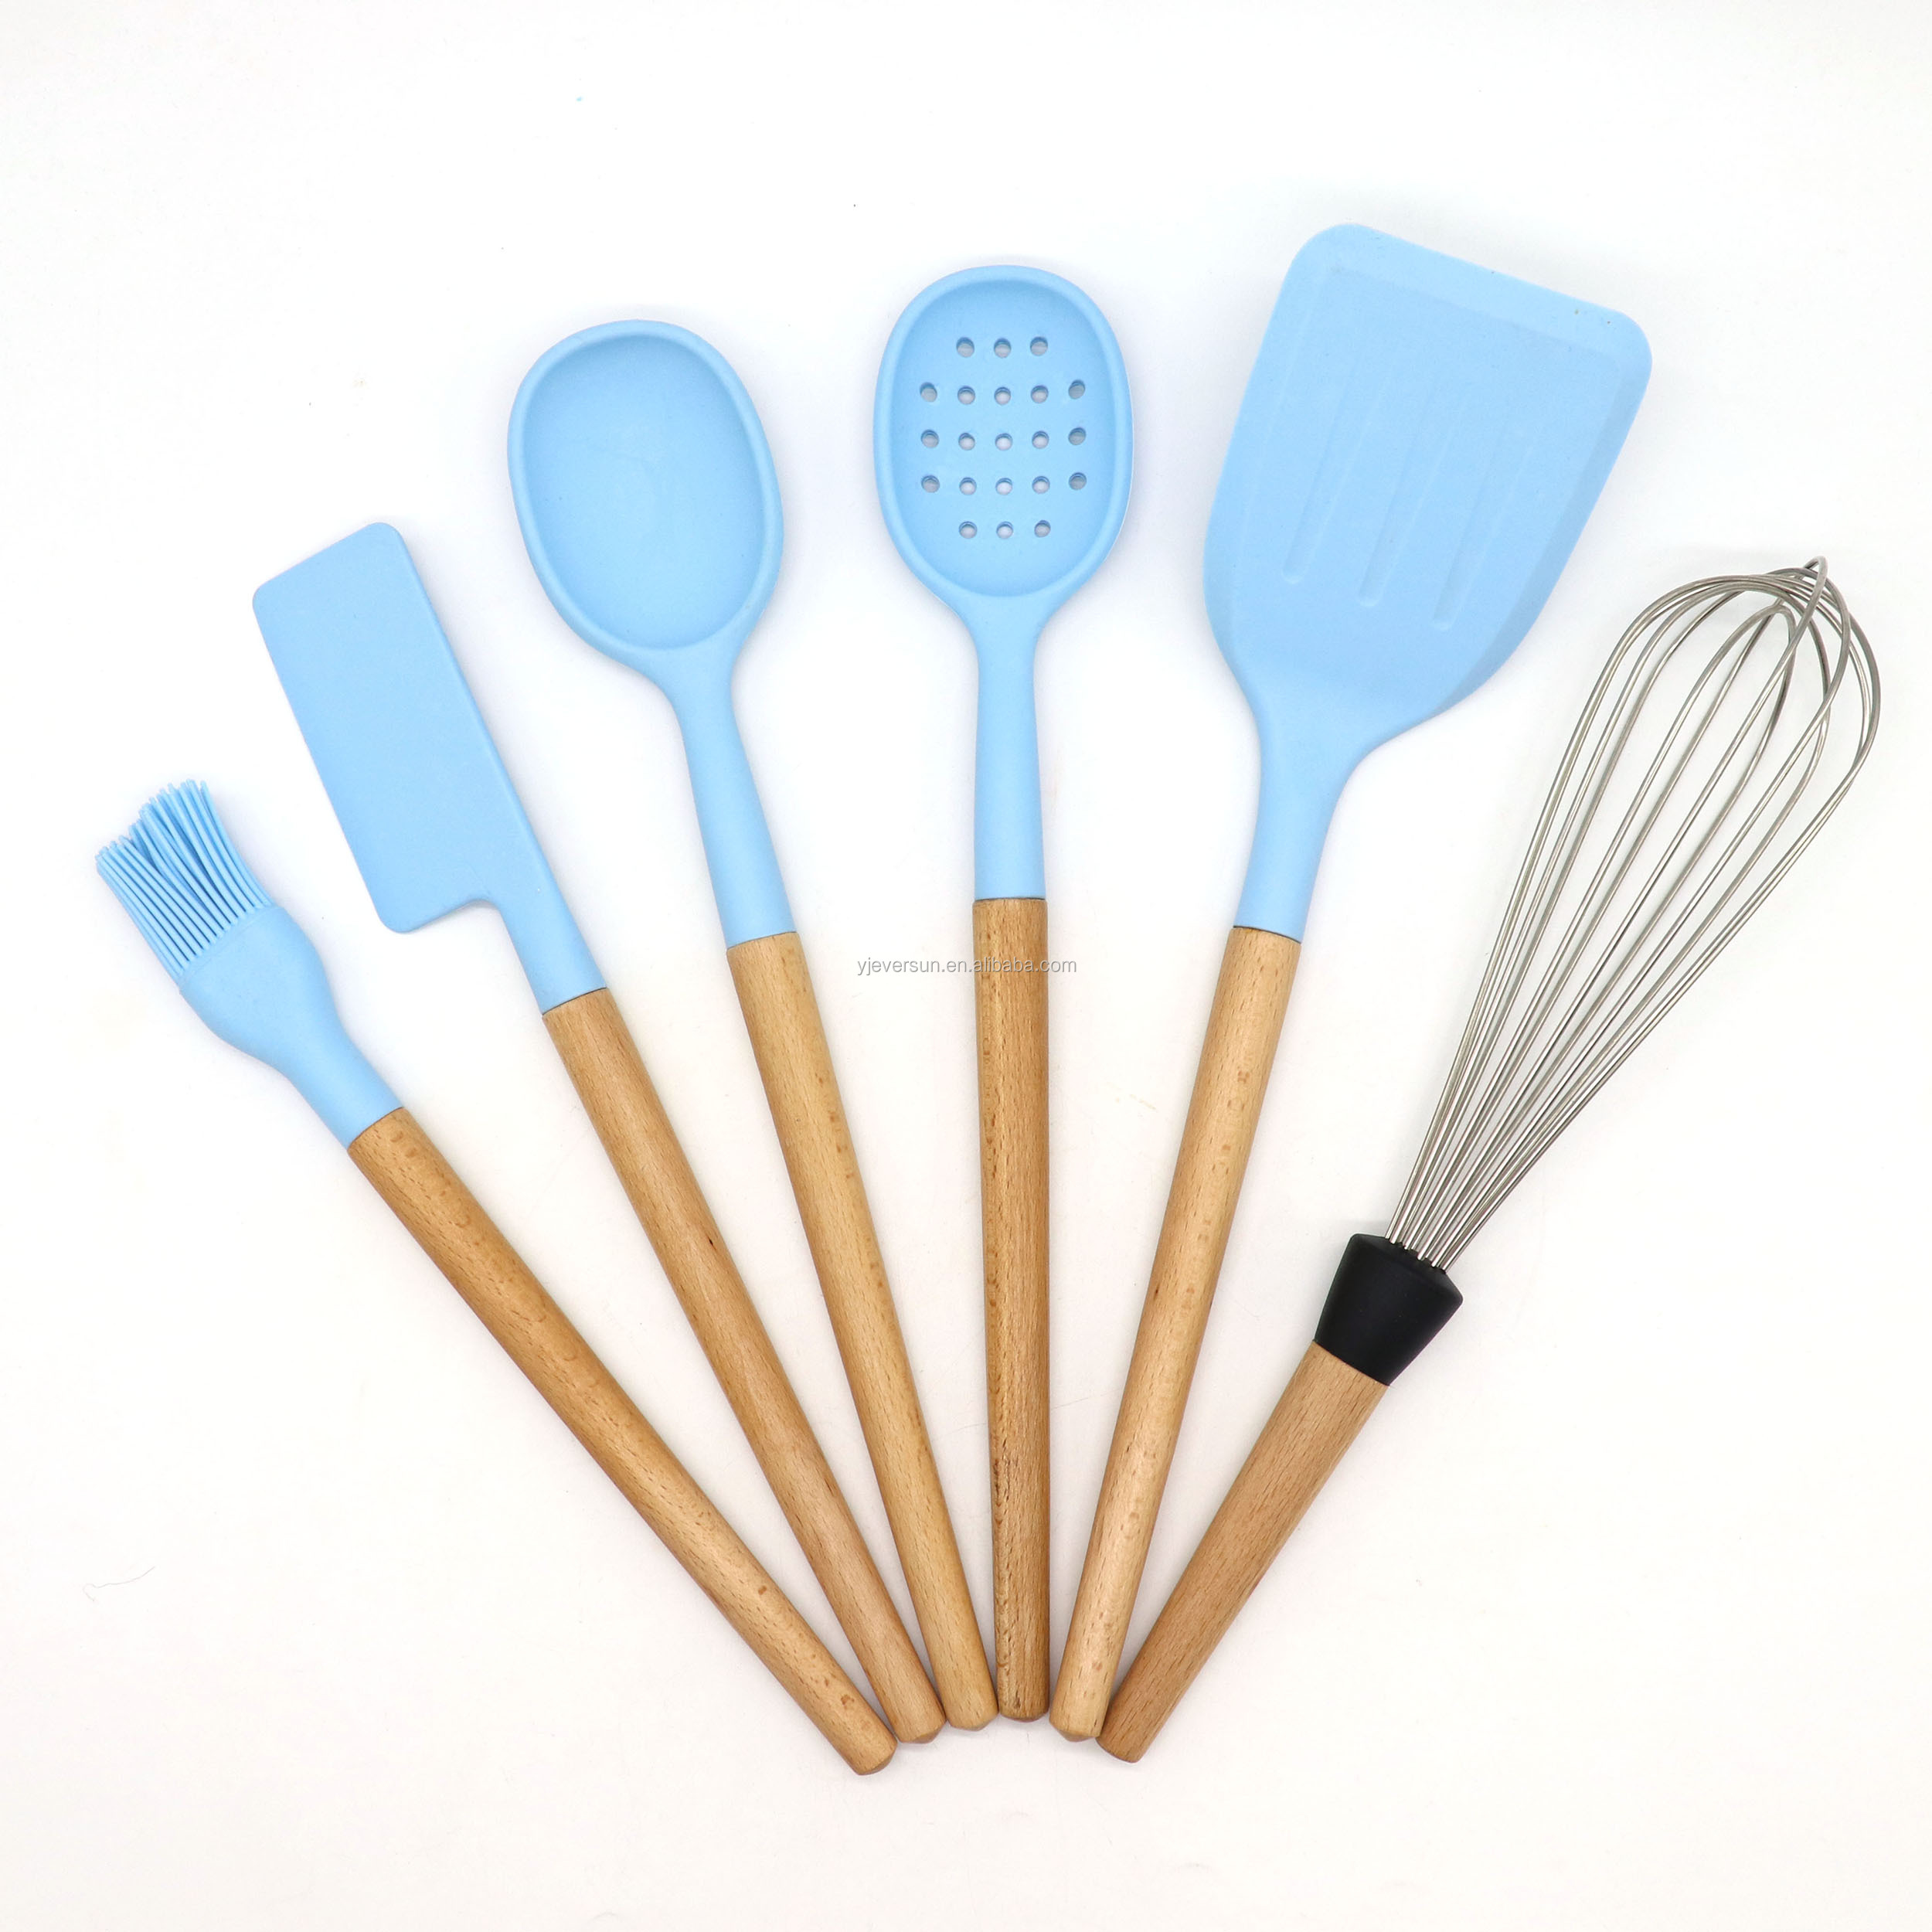 Single 35.5cm Wooden Spoon 14inch Wooden Utensils Kitchen Utensils